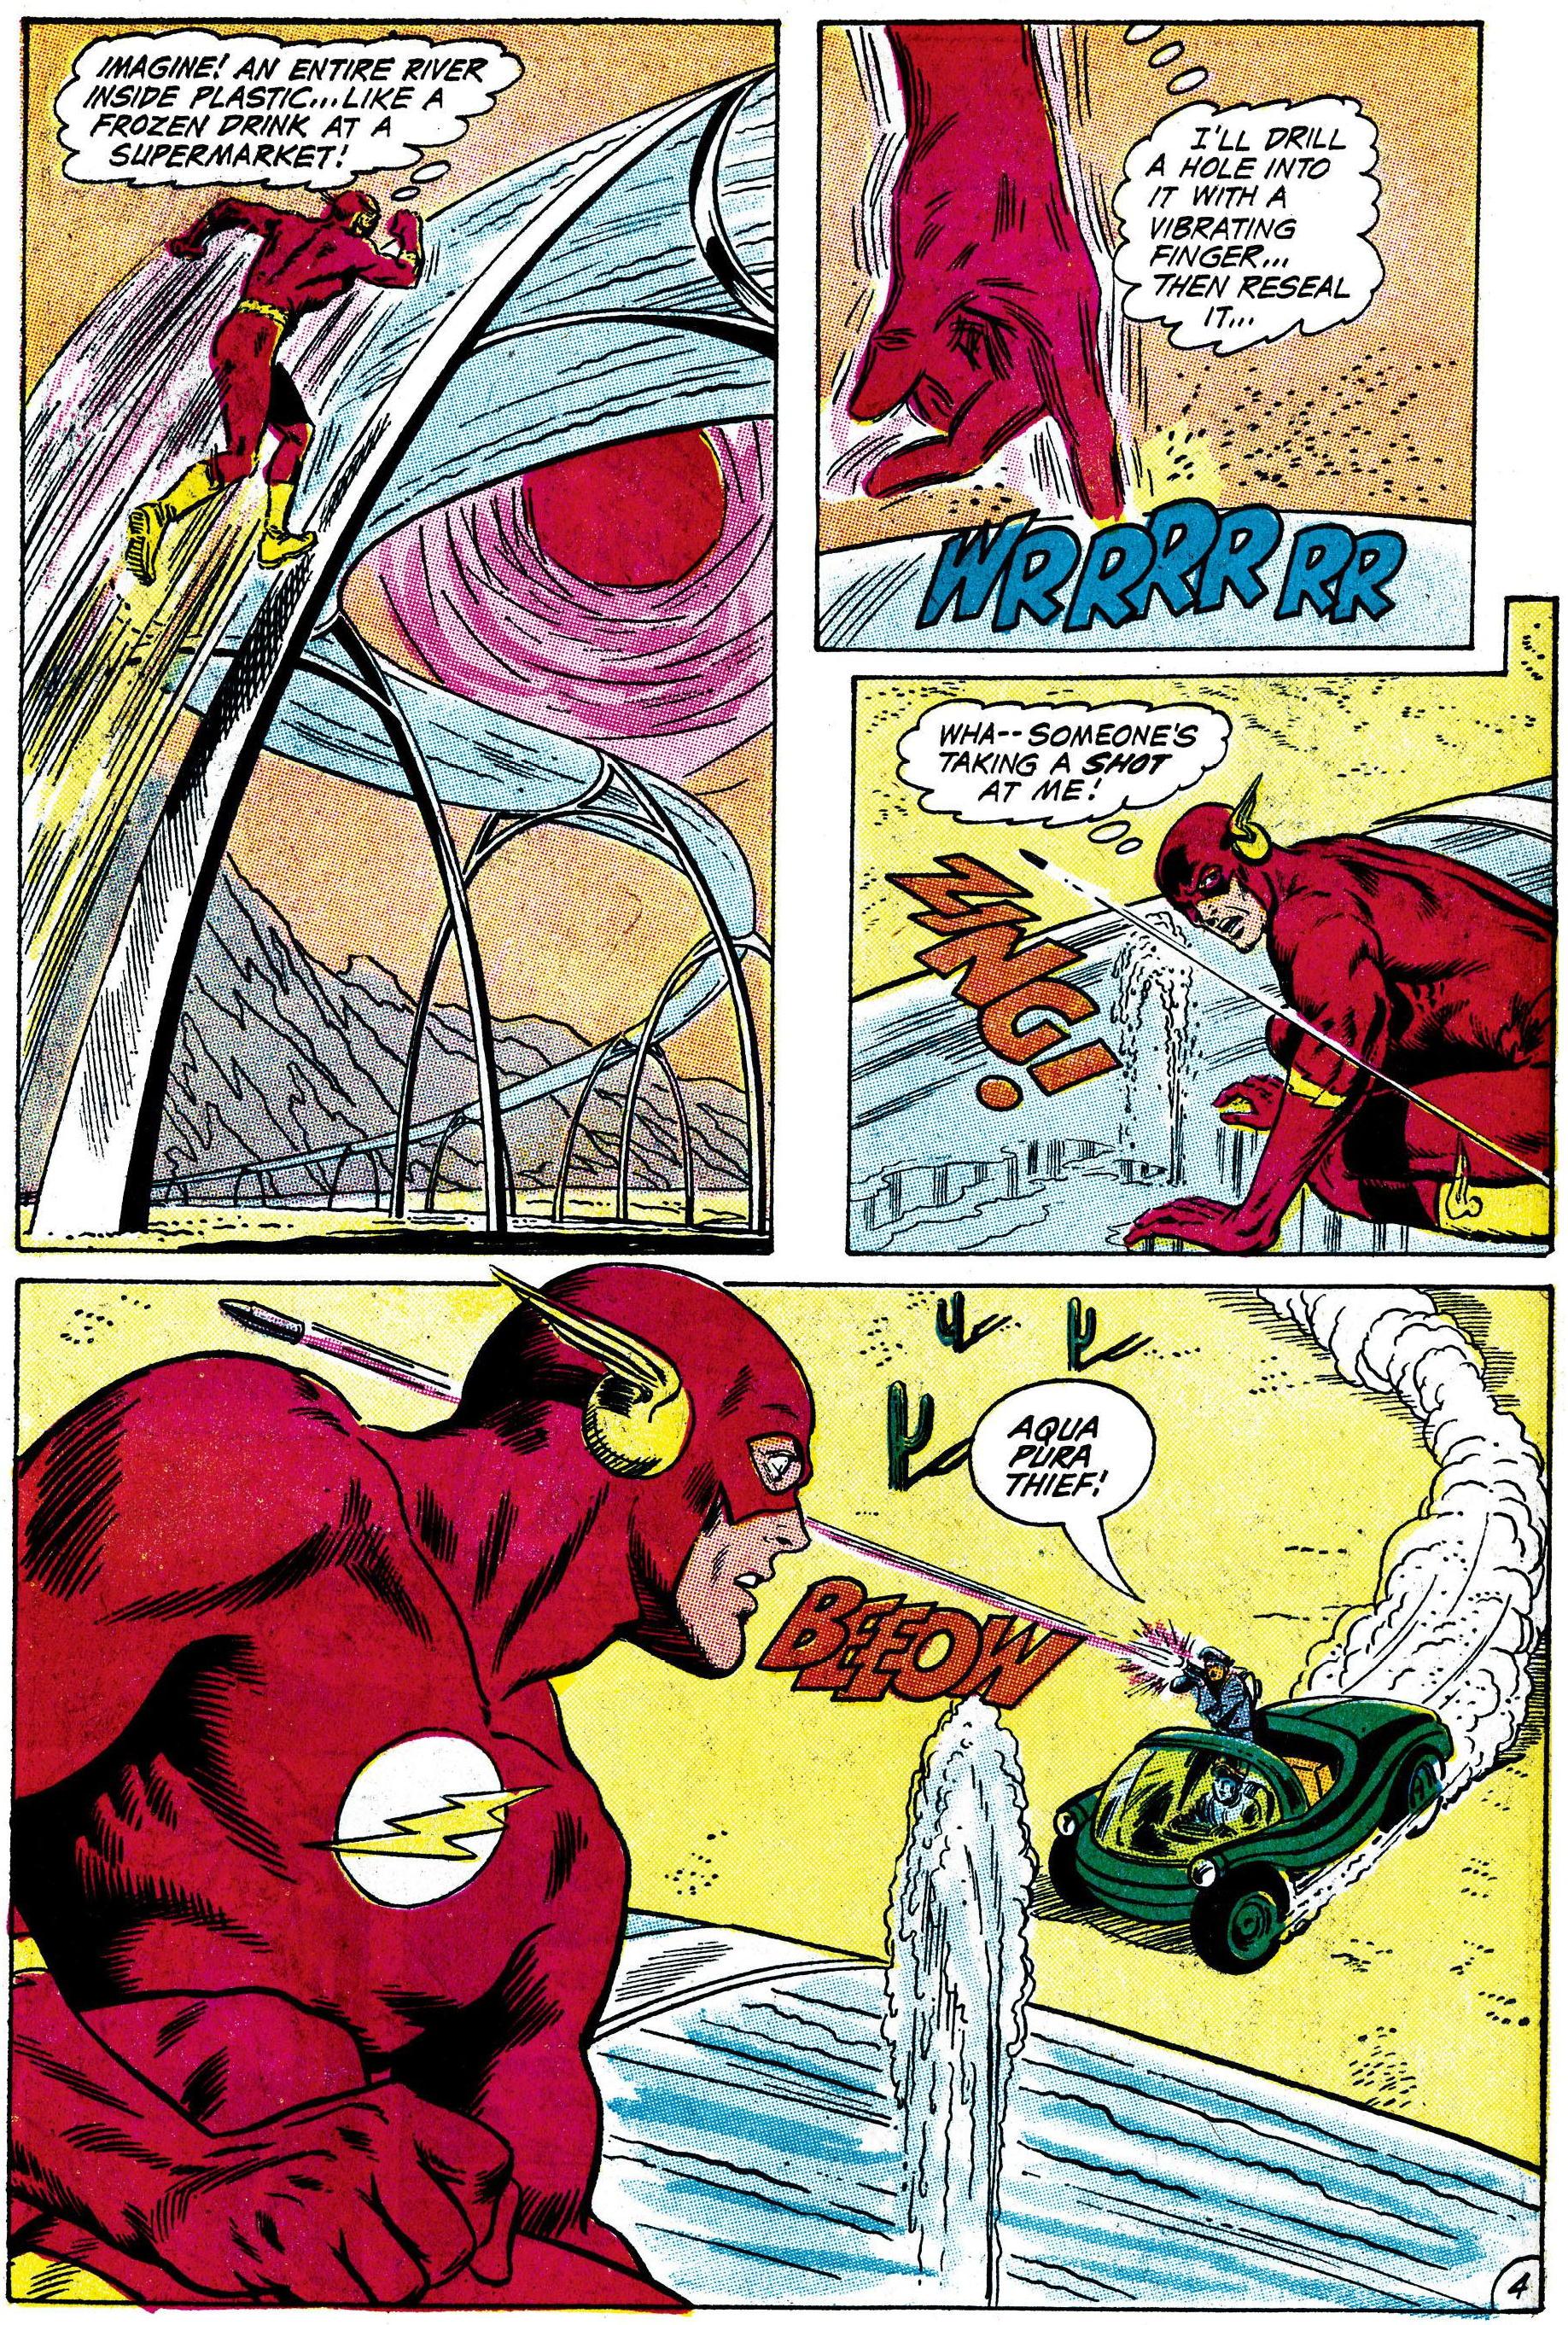 Flash #203 (February, 1971)